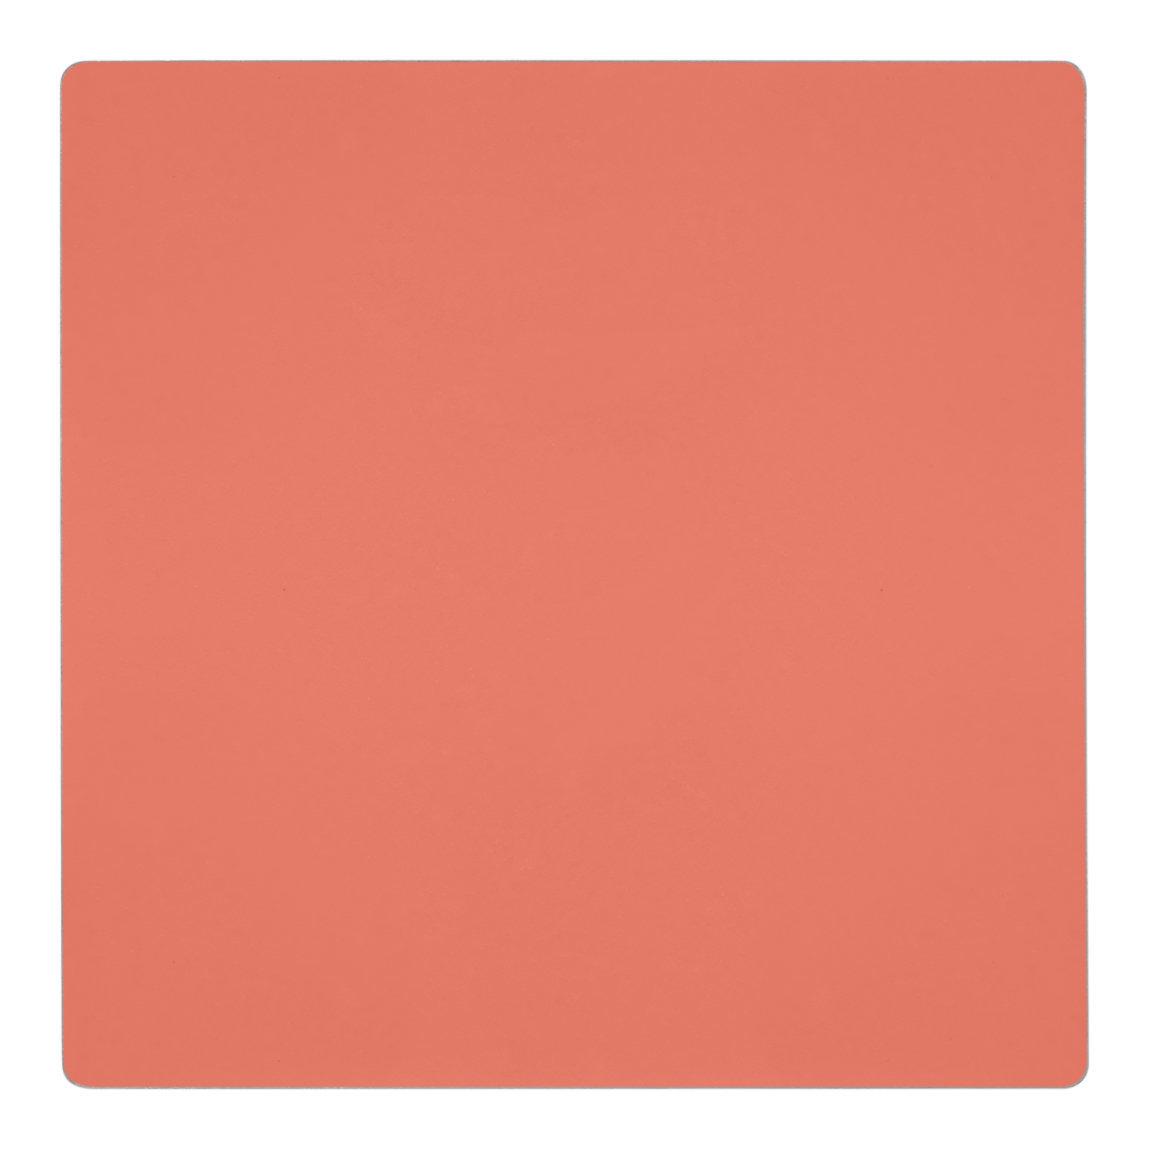 Kjaer Weis Cream Blush Refill Sun Touched